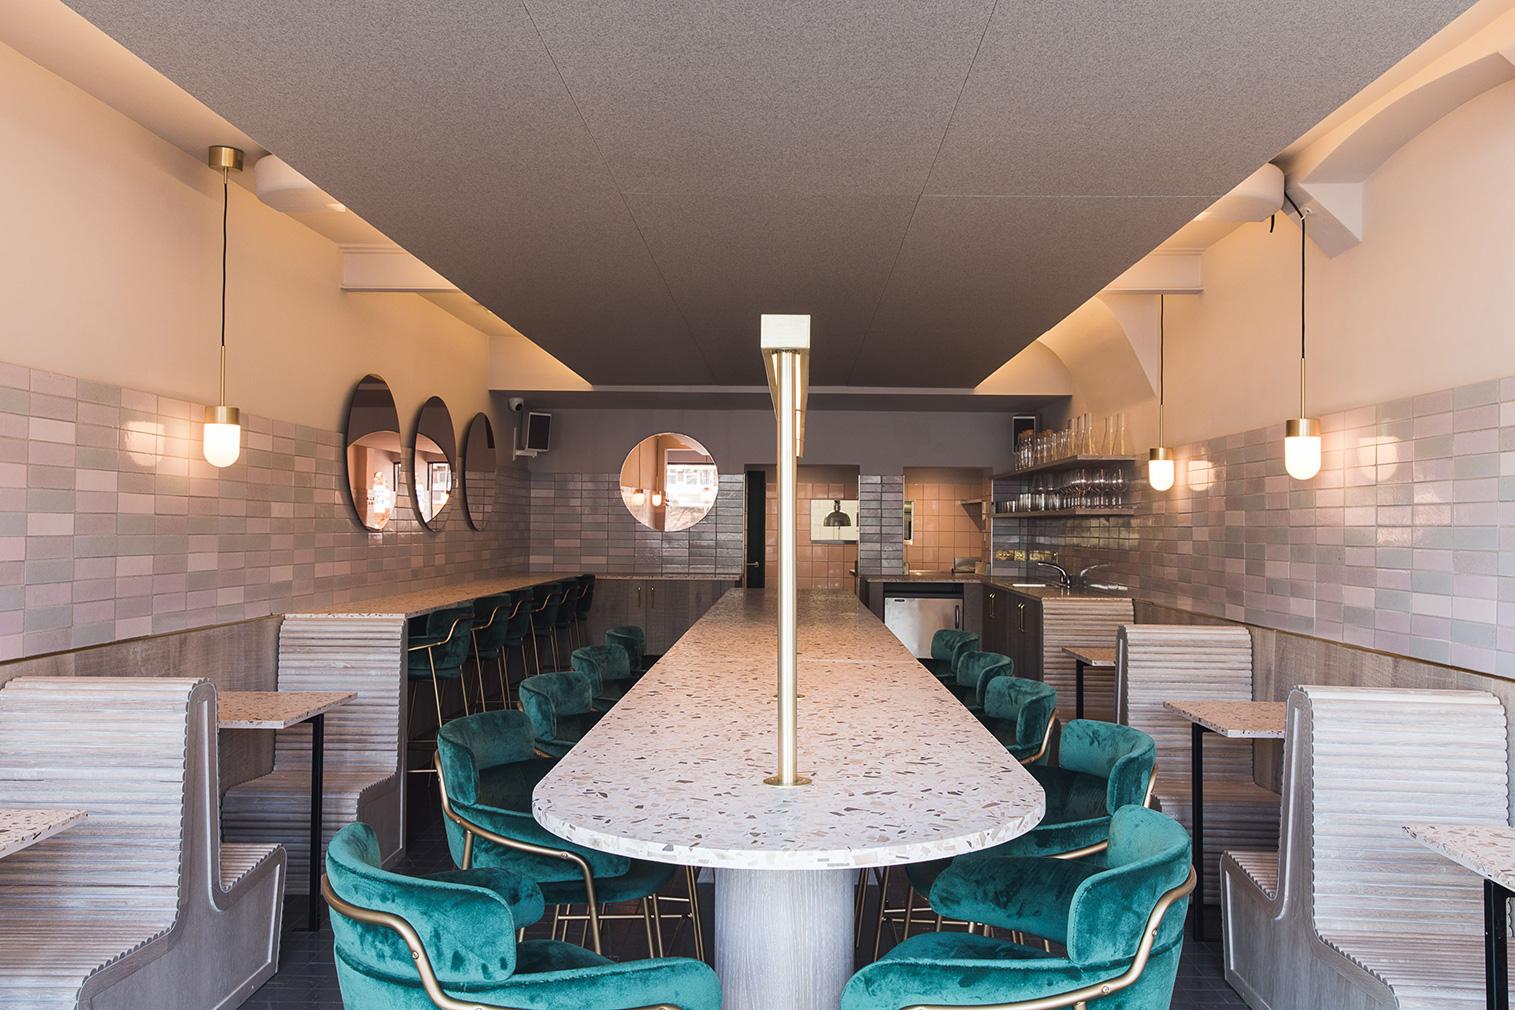 New London restaurants to visit this autumn -- Sapling